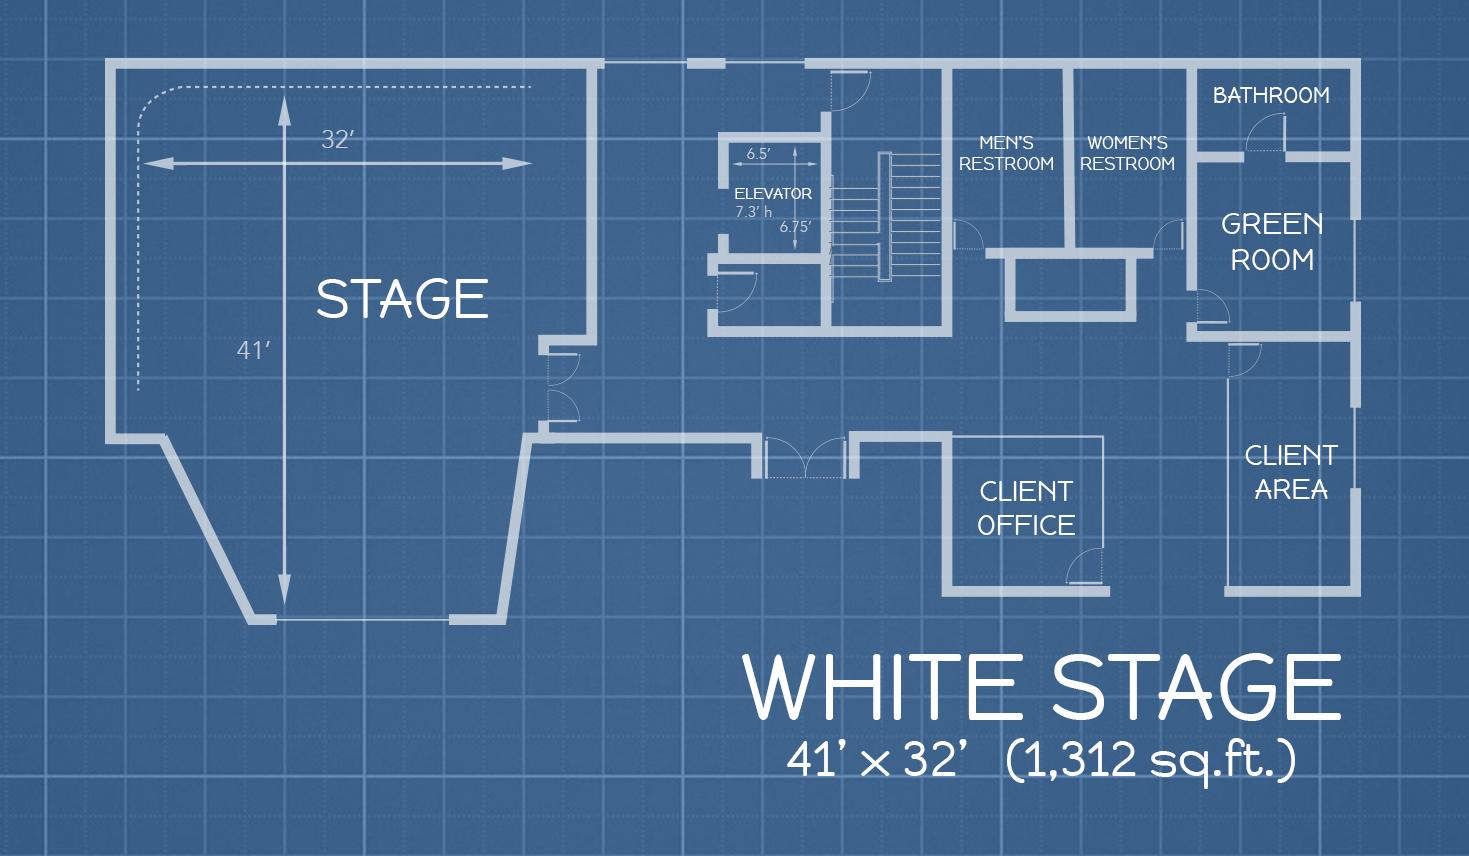 022318_WhiteStage.jpg